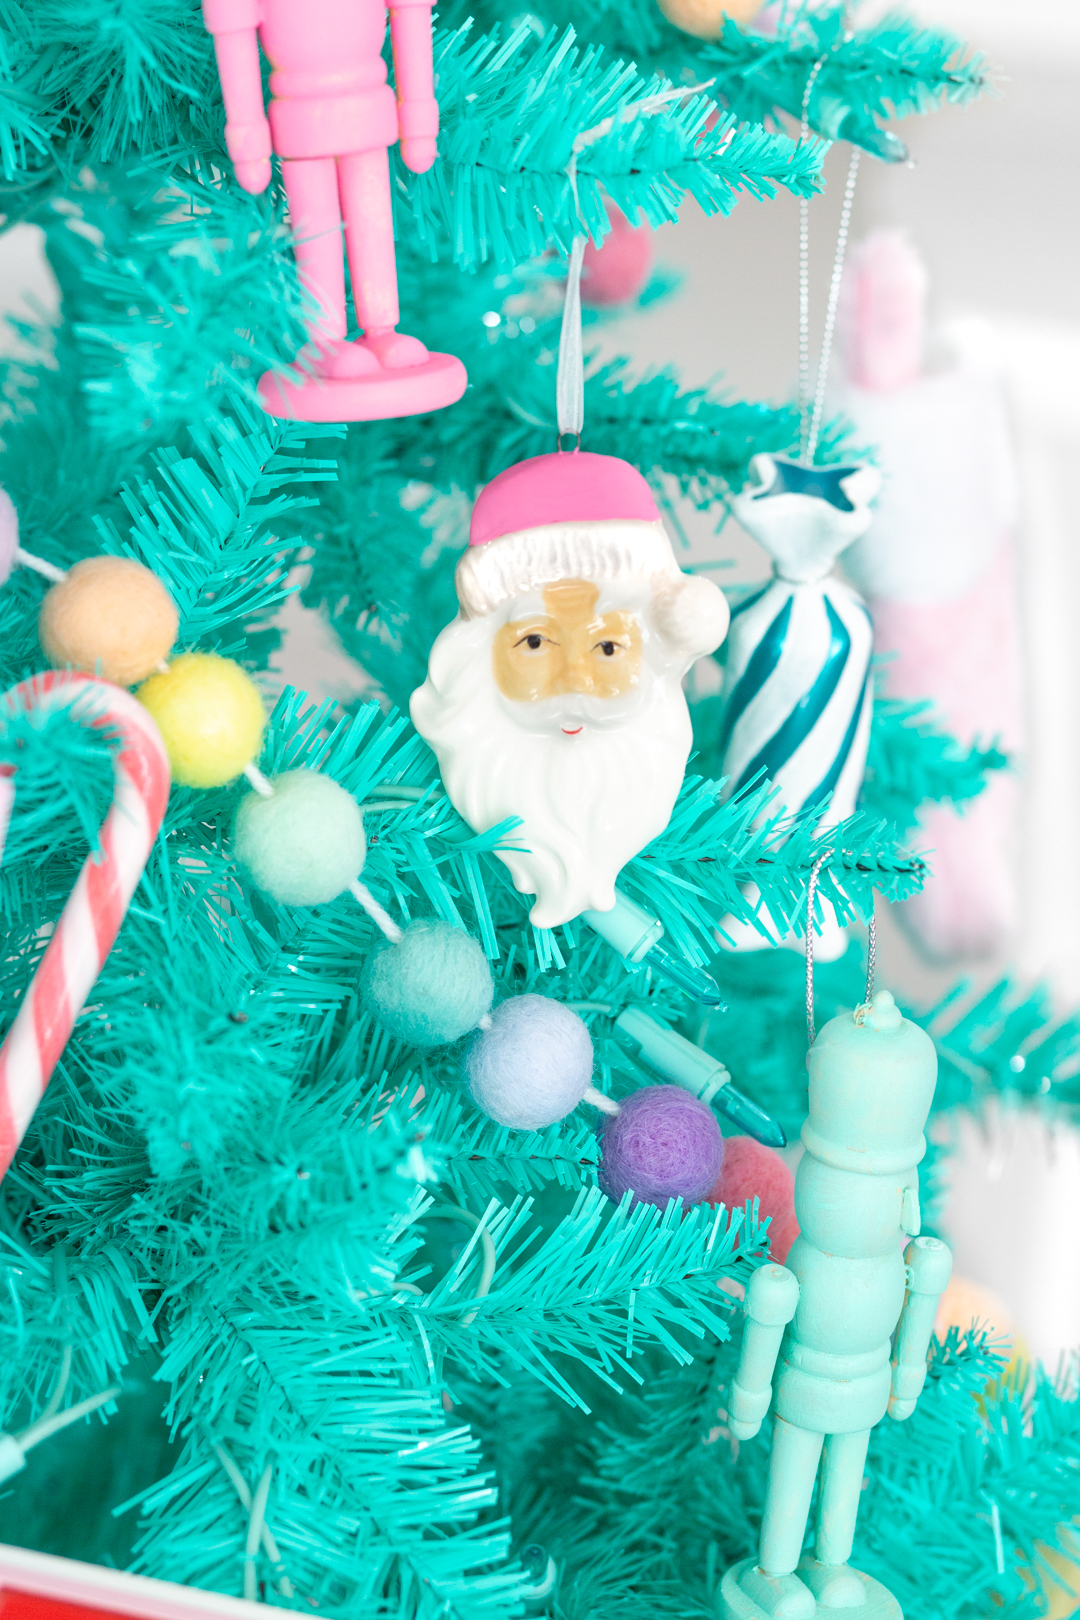 pink santa claus ornament